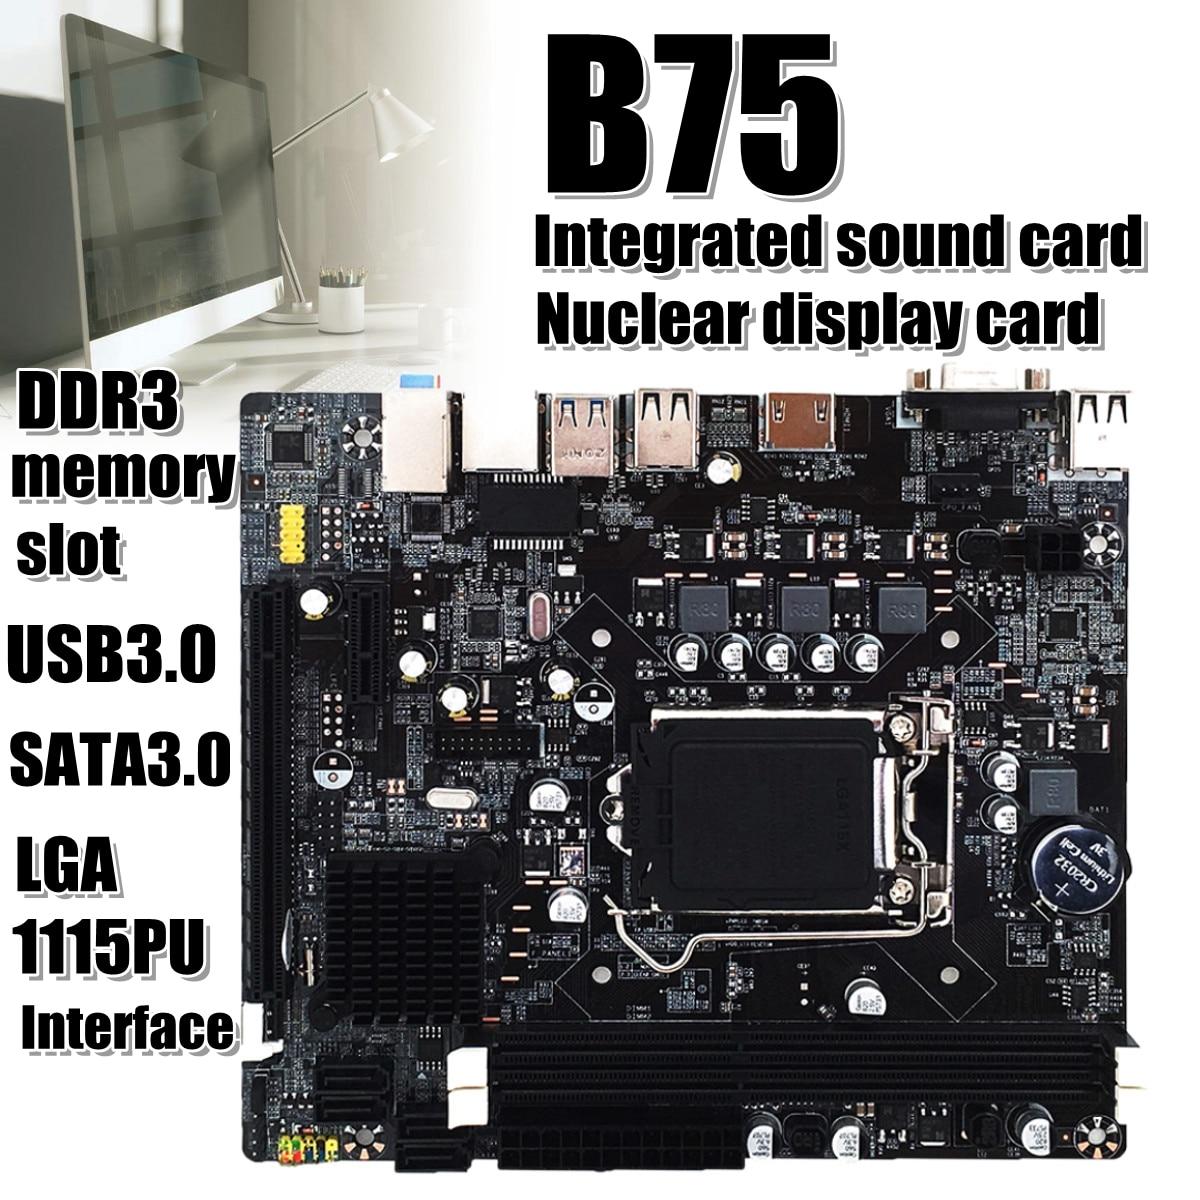 LGA B75 Motherboard Desktop Computer Mainboard Motherboard with dual USB 3.0 for DDR3 1600/1333/1066/1866